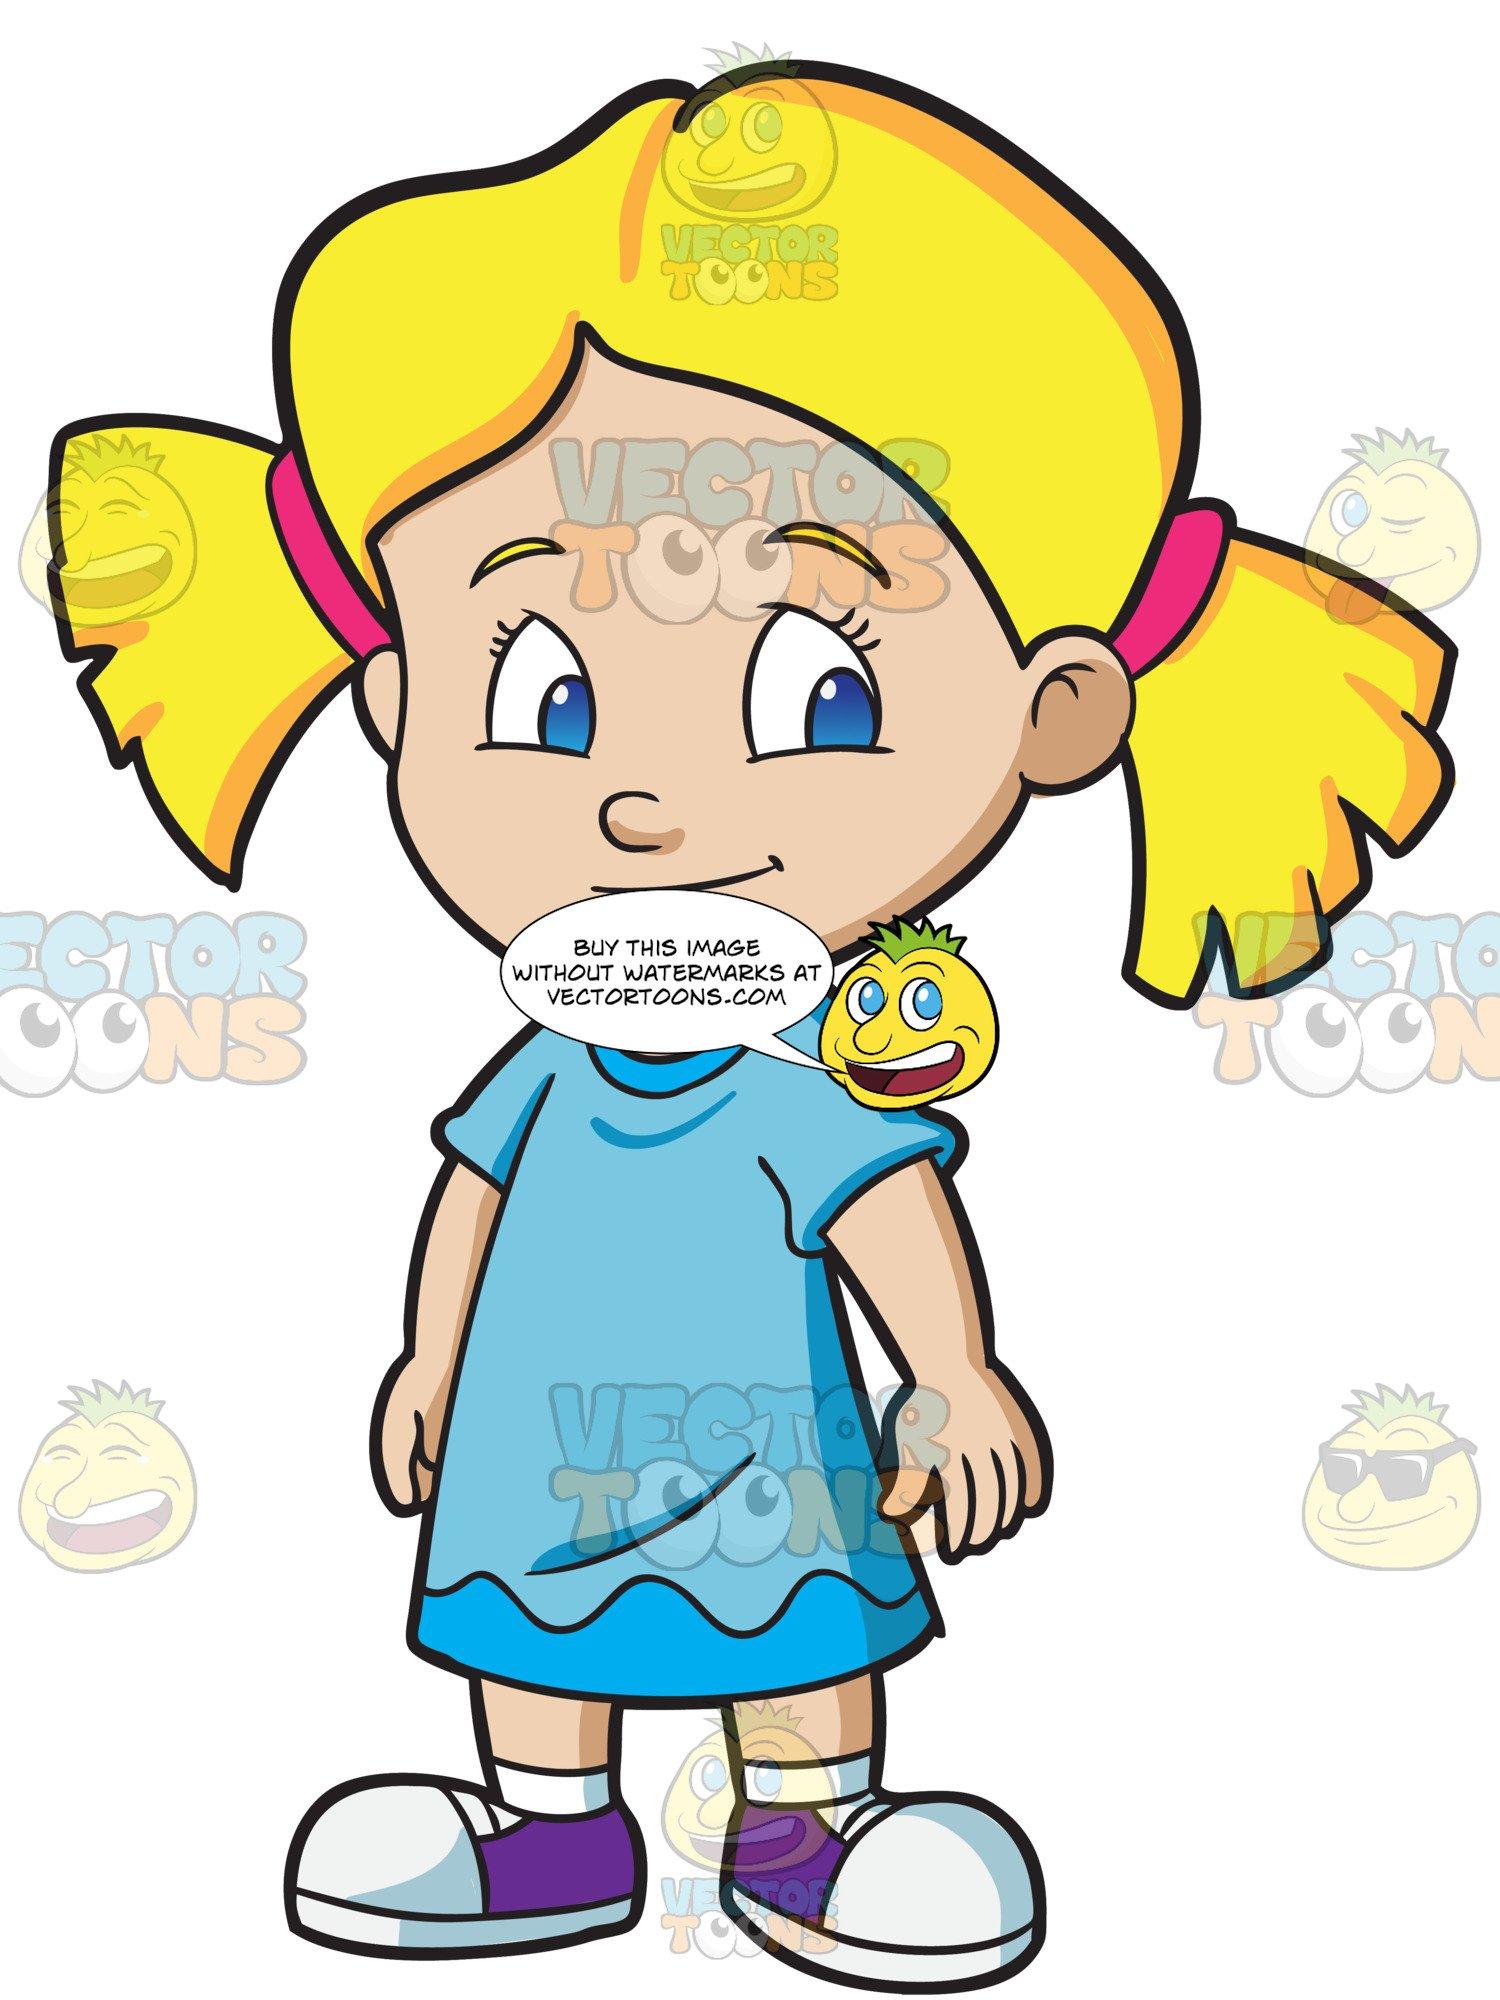 An Adorable Preschool Girl In Pigtails.